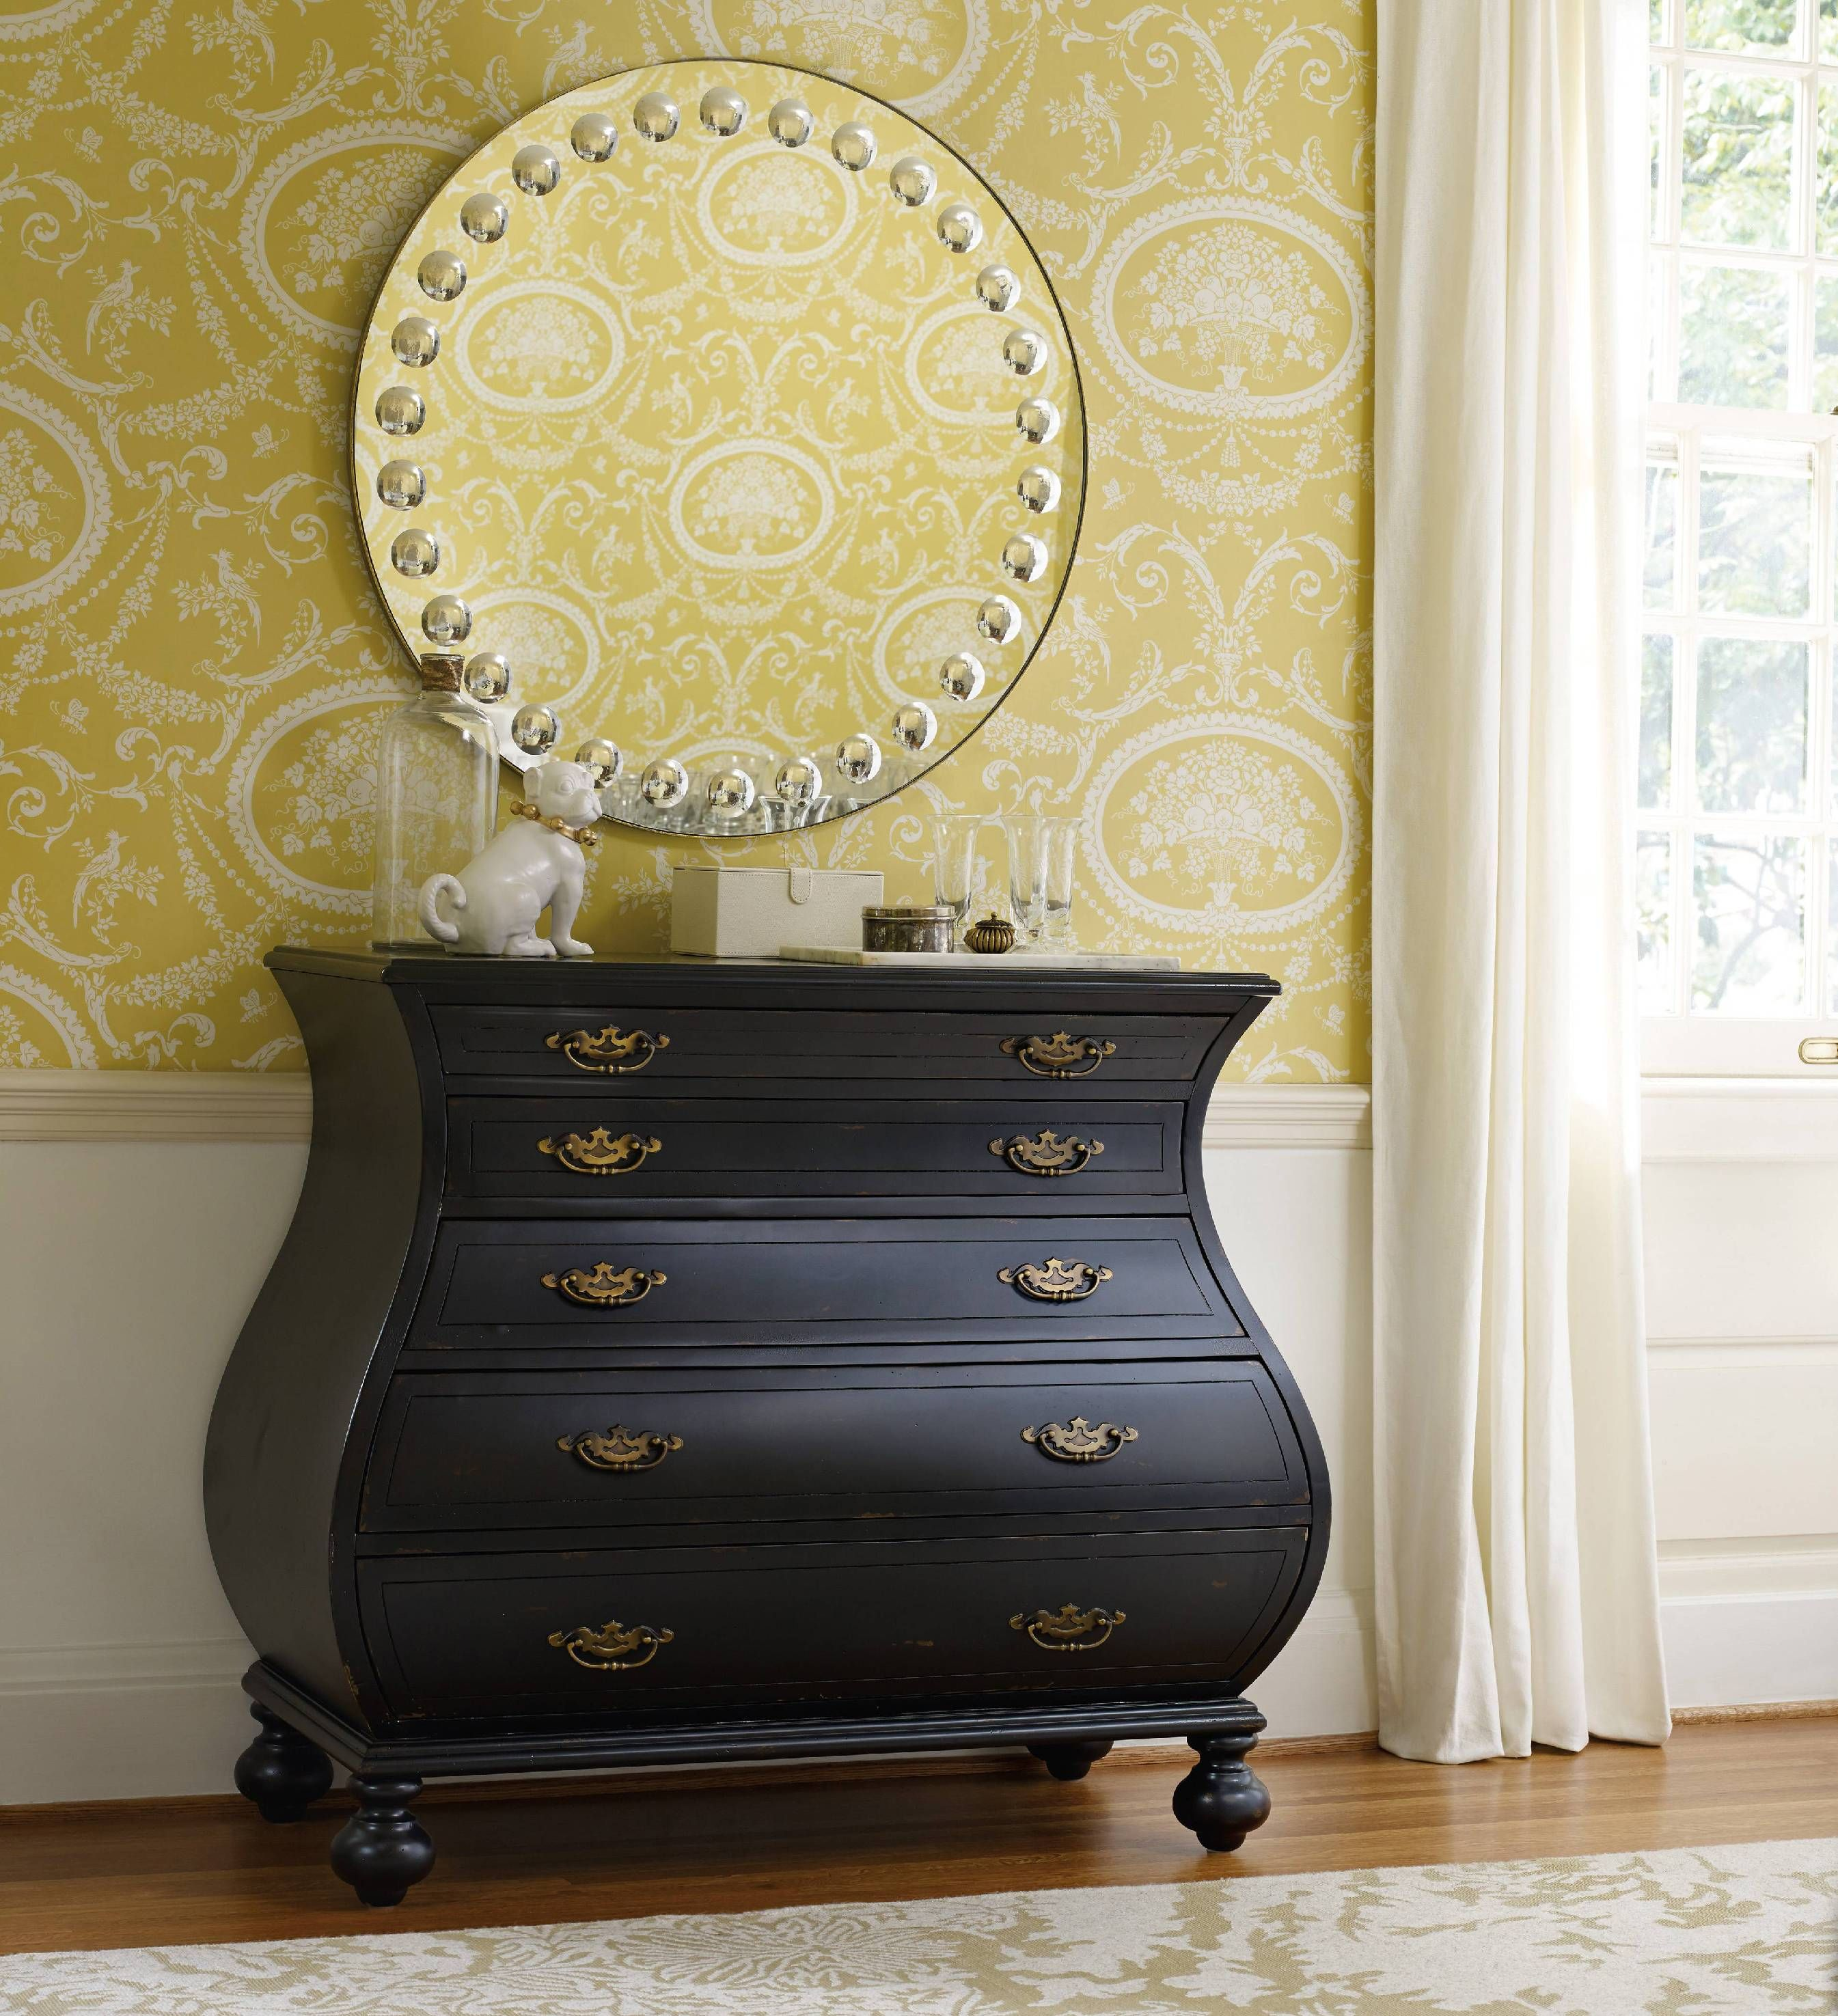 Hooker Furniture Living Room Black Bombe Chest 5219-85001 | DIFFA ...